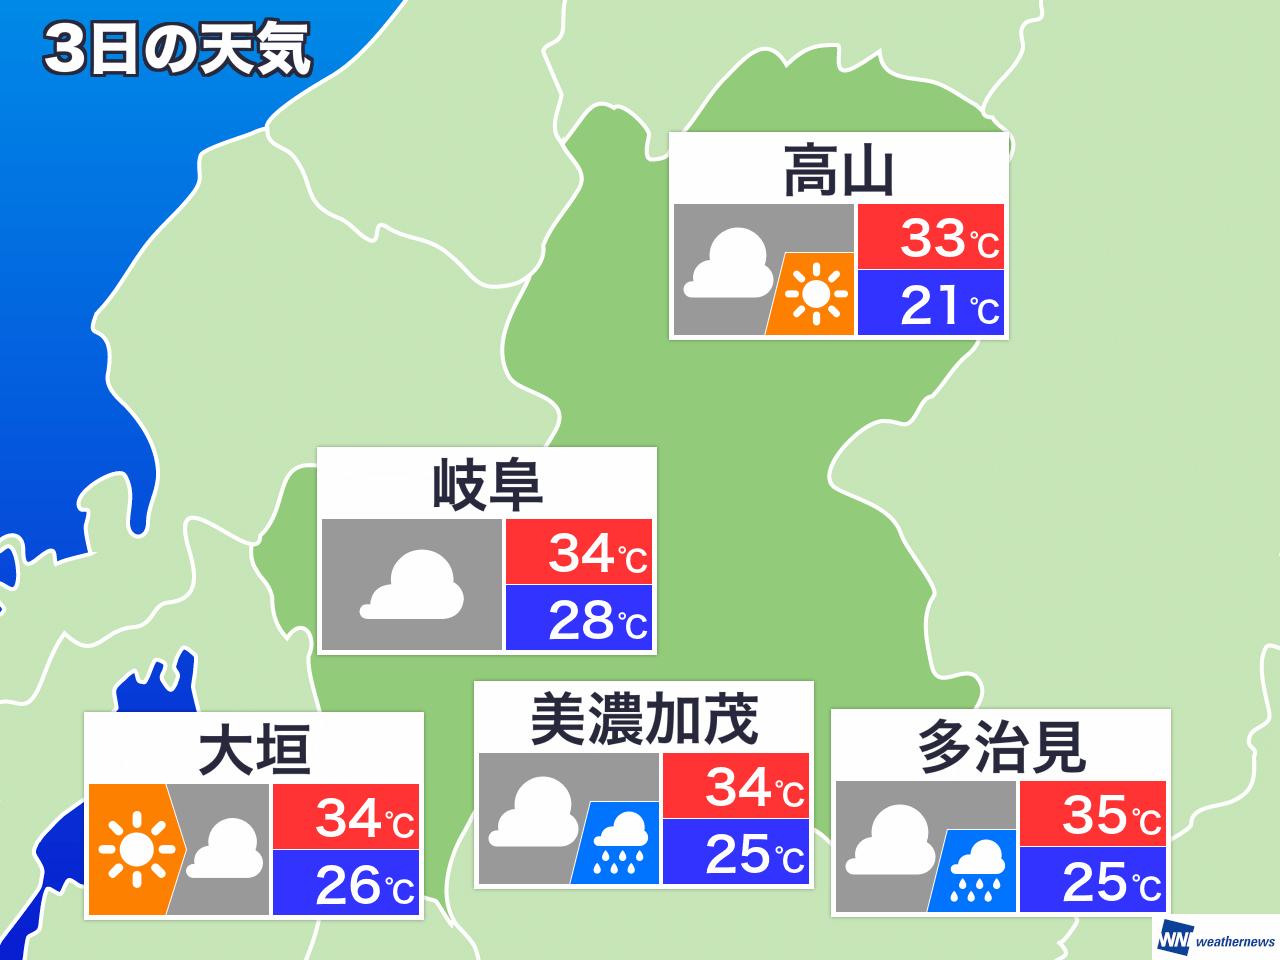 市 天気 今日 の 岐阜